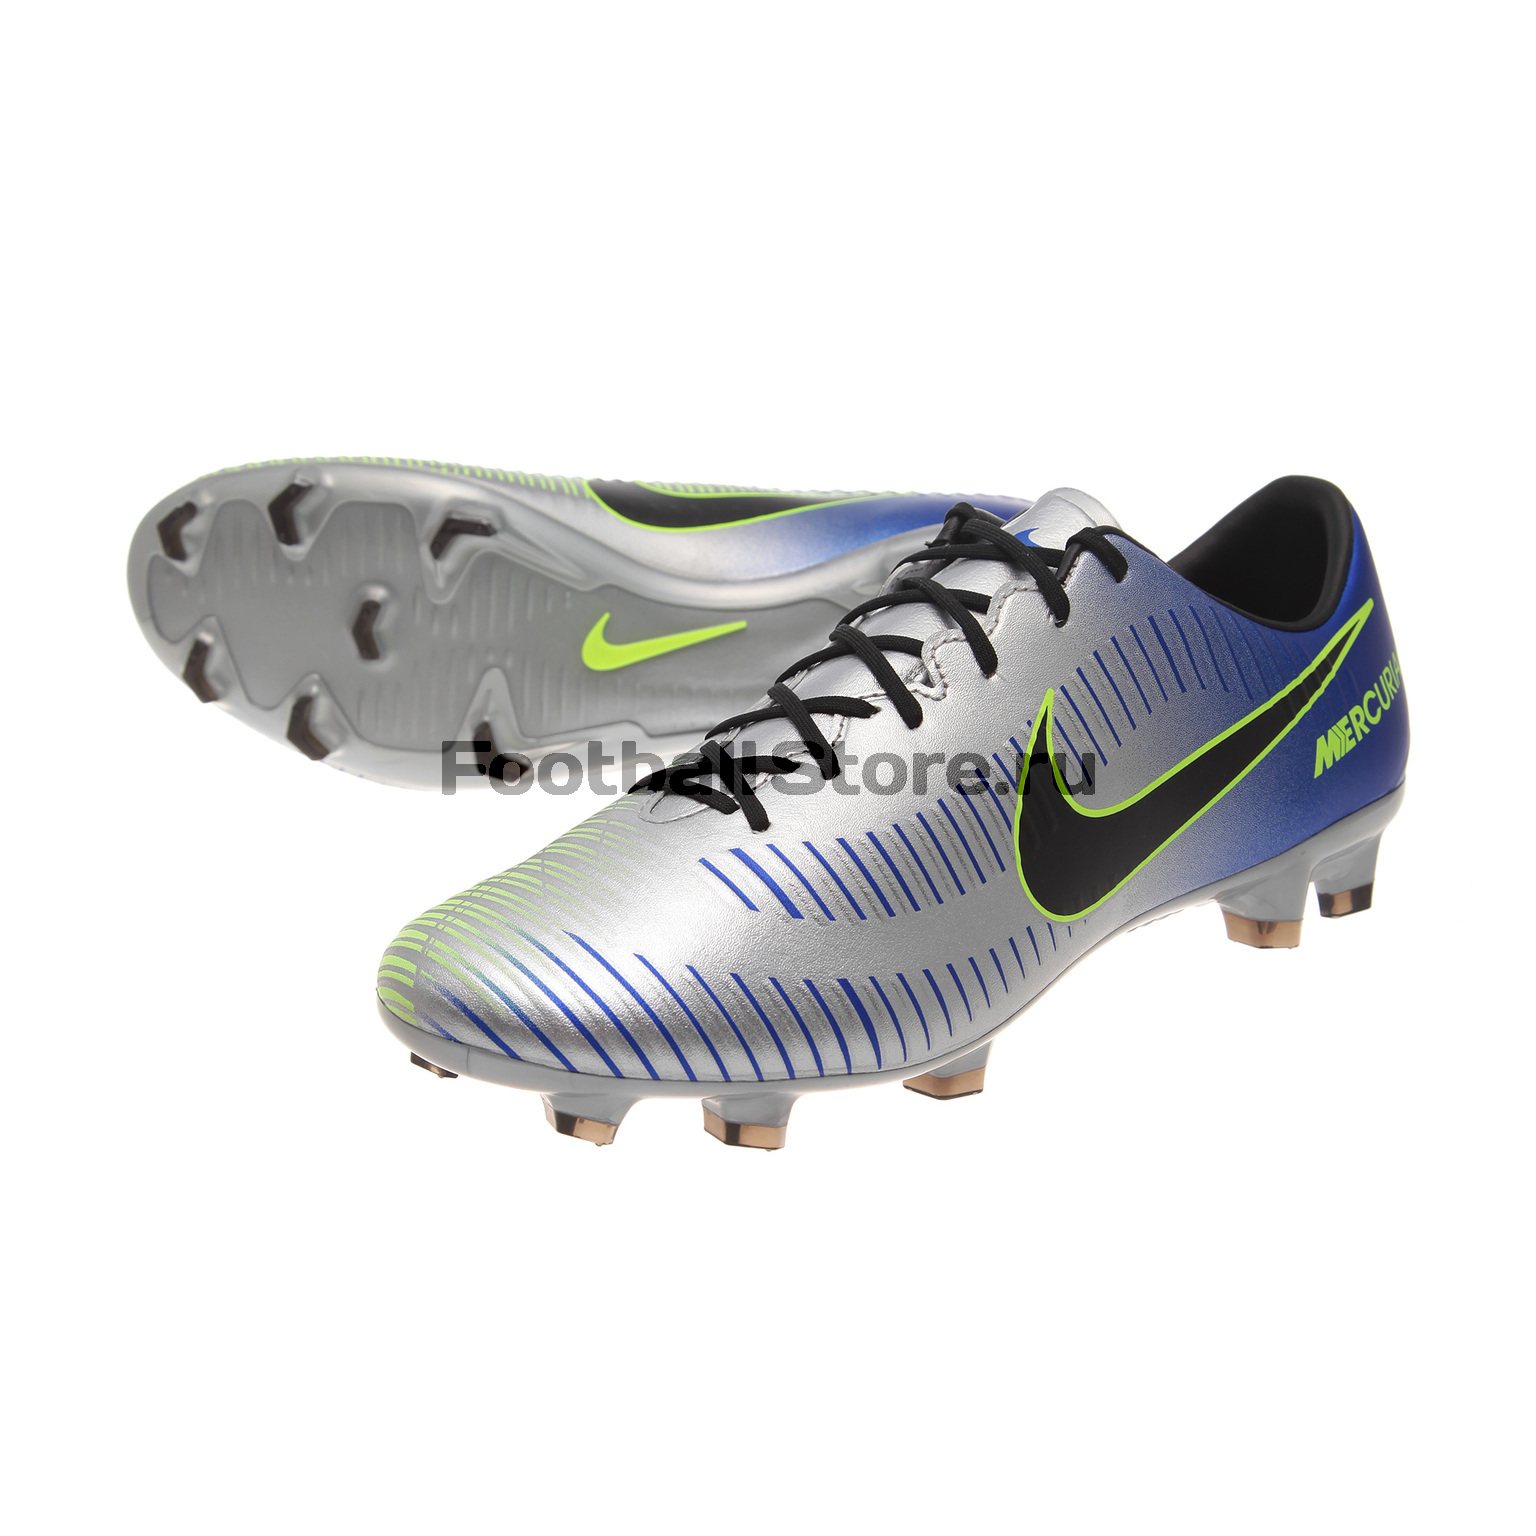 Бутсы Nike Mercurial Veloce III Neymar FG 921505-407 бутсы футбольные nike mercurial victory vi njr fg 921488 407 jr детские